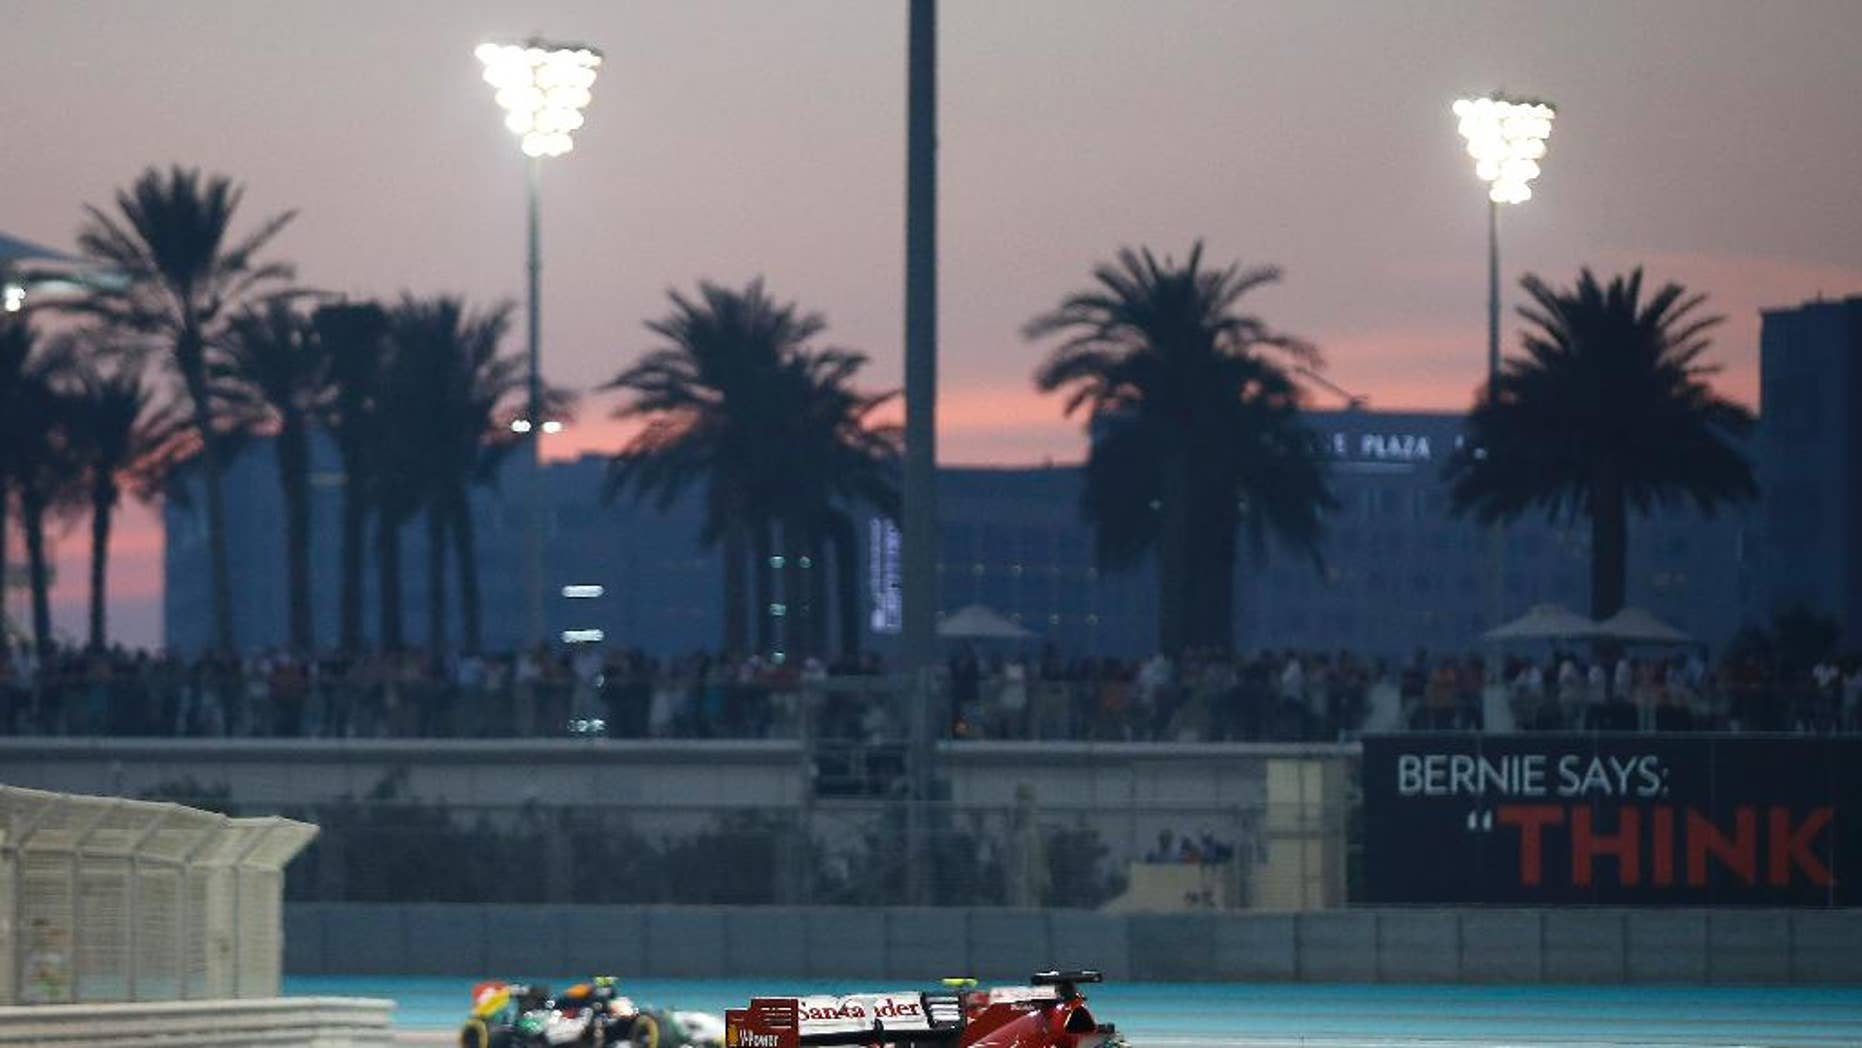 Ferrari driver Fernando Alonso of Spain races during the Emirates Formula One Grand Prix at the Yas Marina racetrack in Abu Dhabi, United Arab Emirates, Sunday, Nov. 23, 2014. (AP Photo/Luca Bruno)